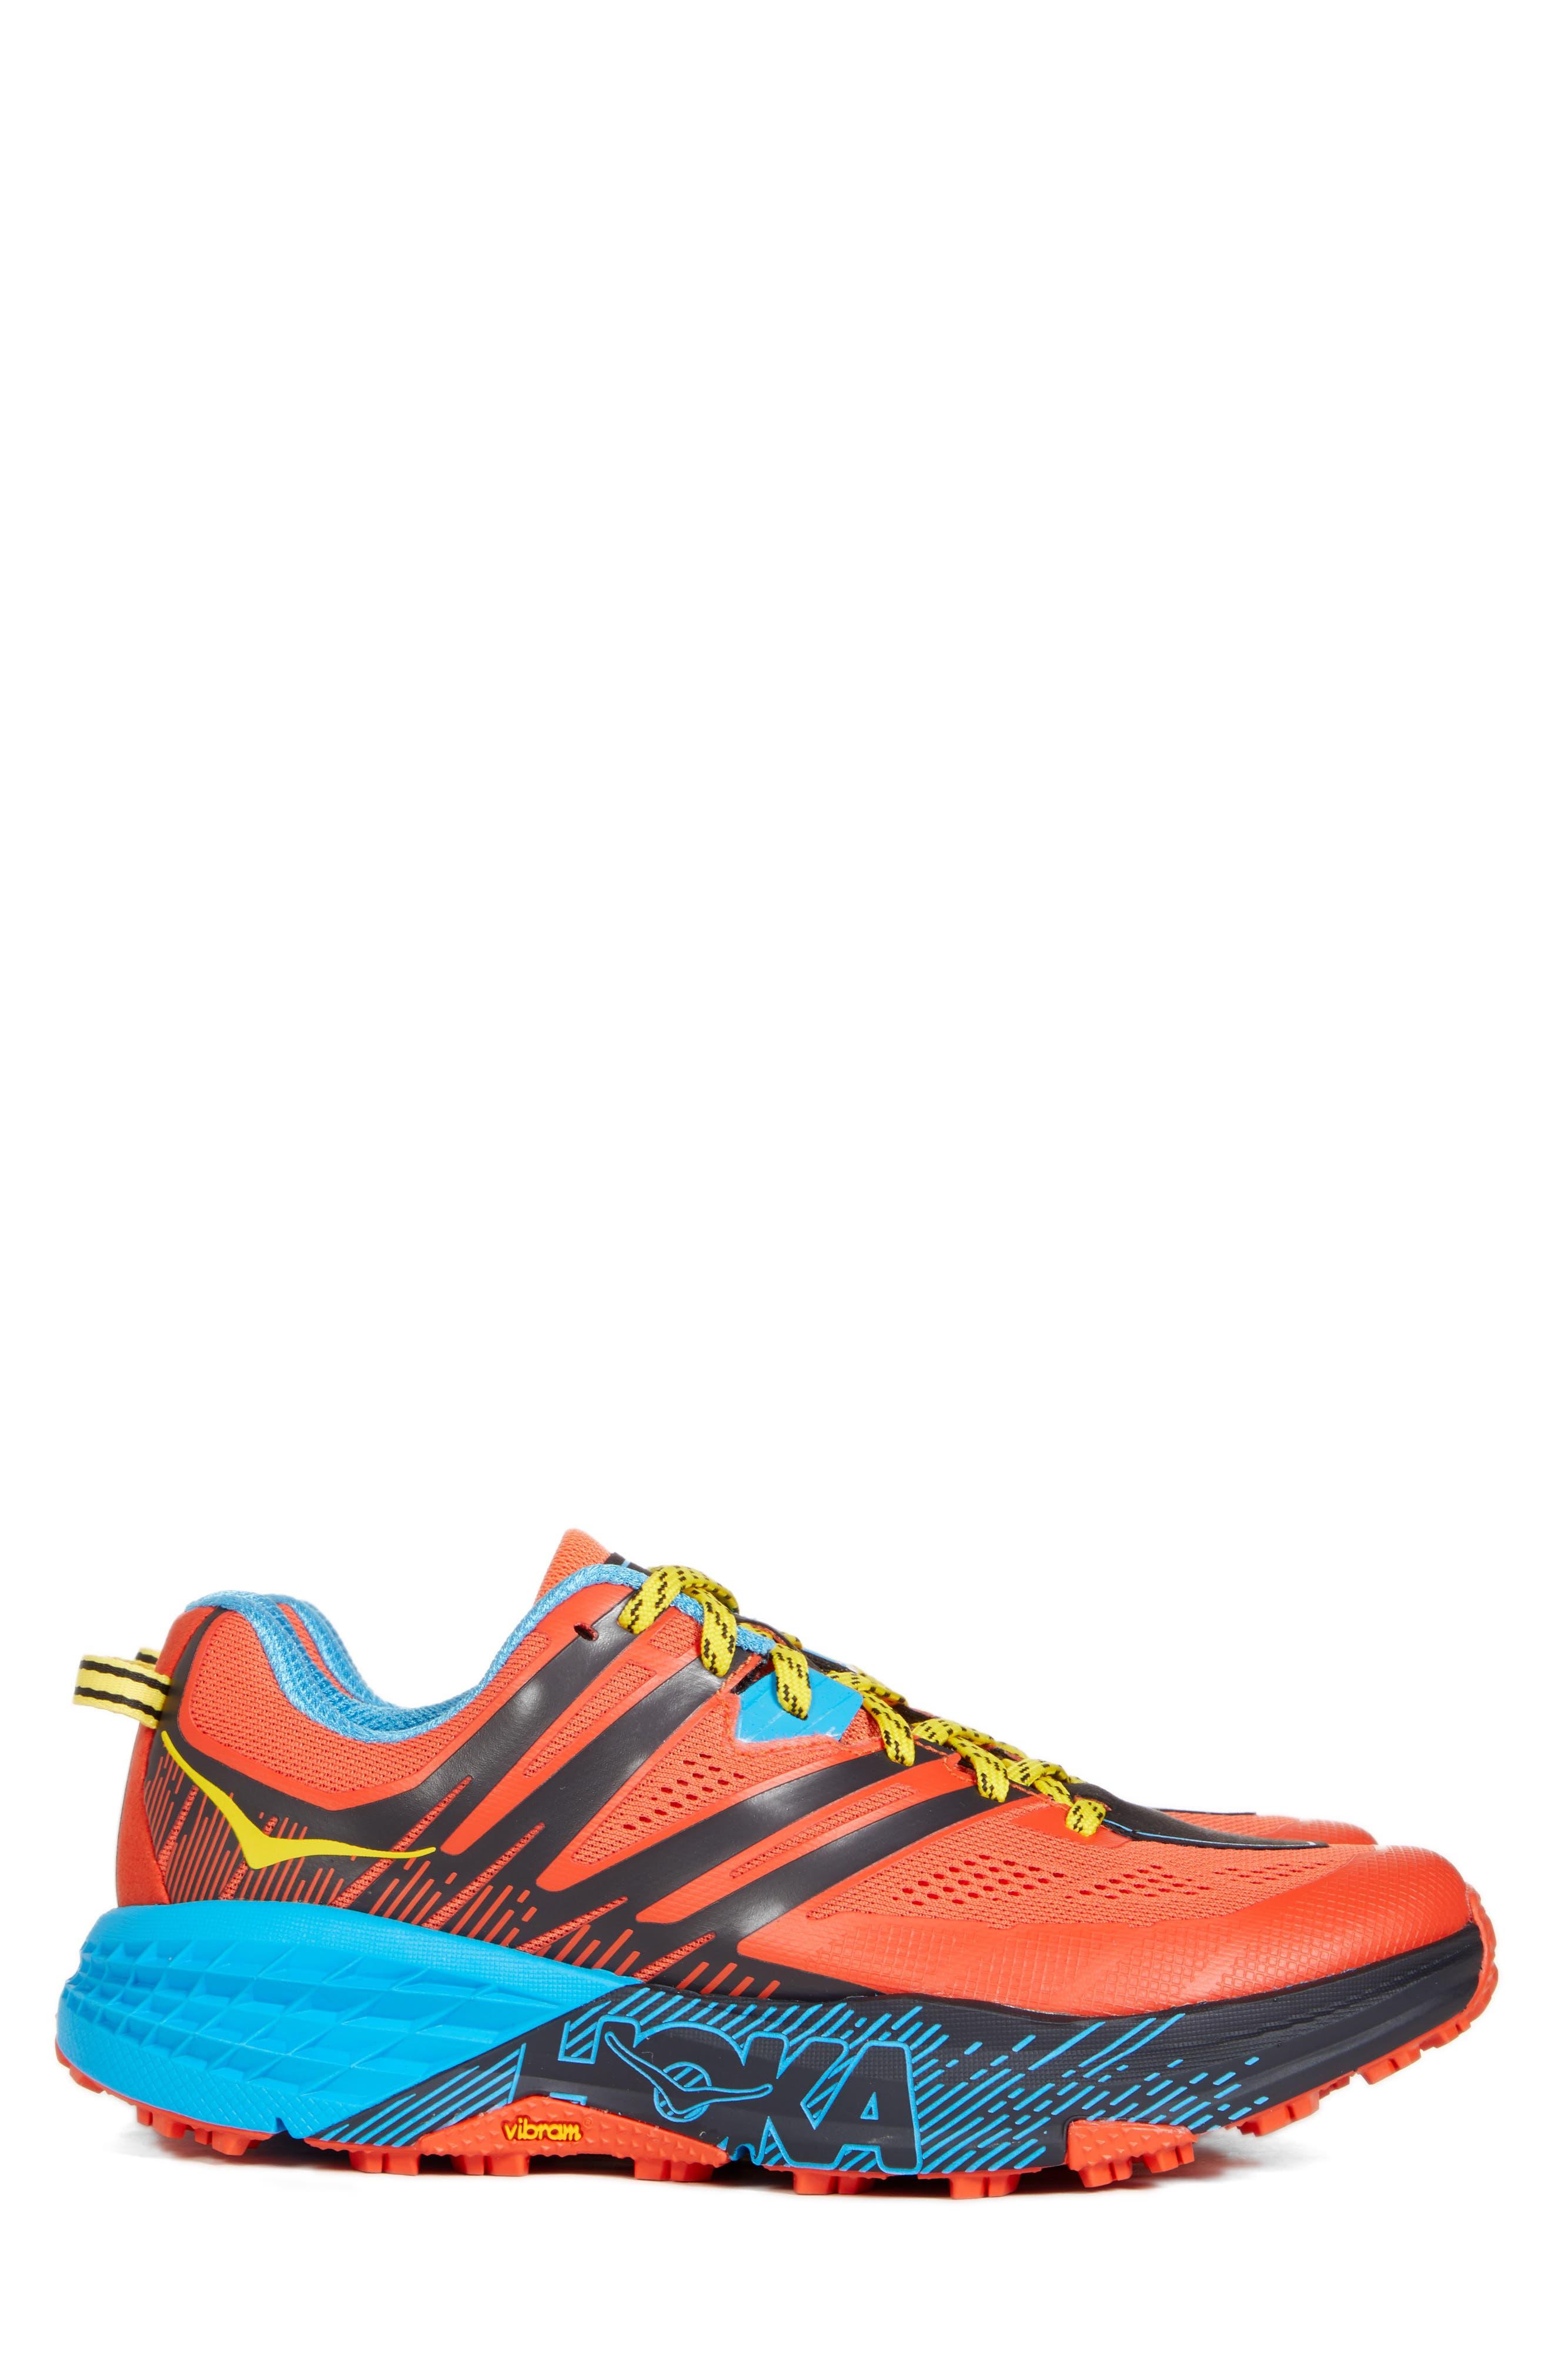 HOKA ONE ONE  Speedgoat 3 Trail Running Shoe, Main, color, 825